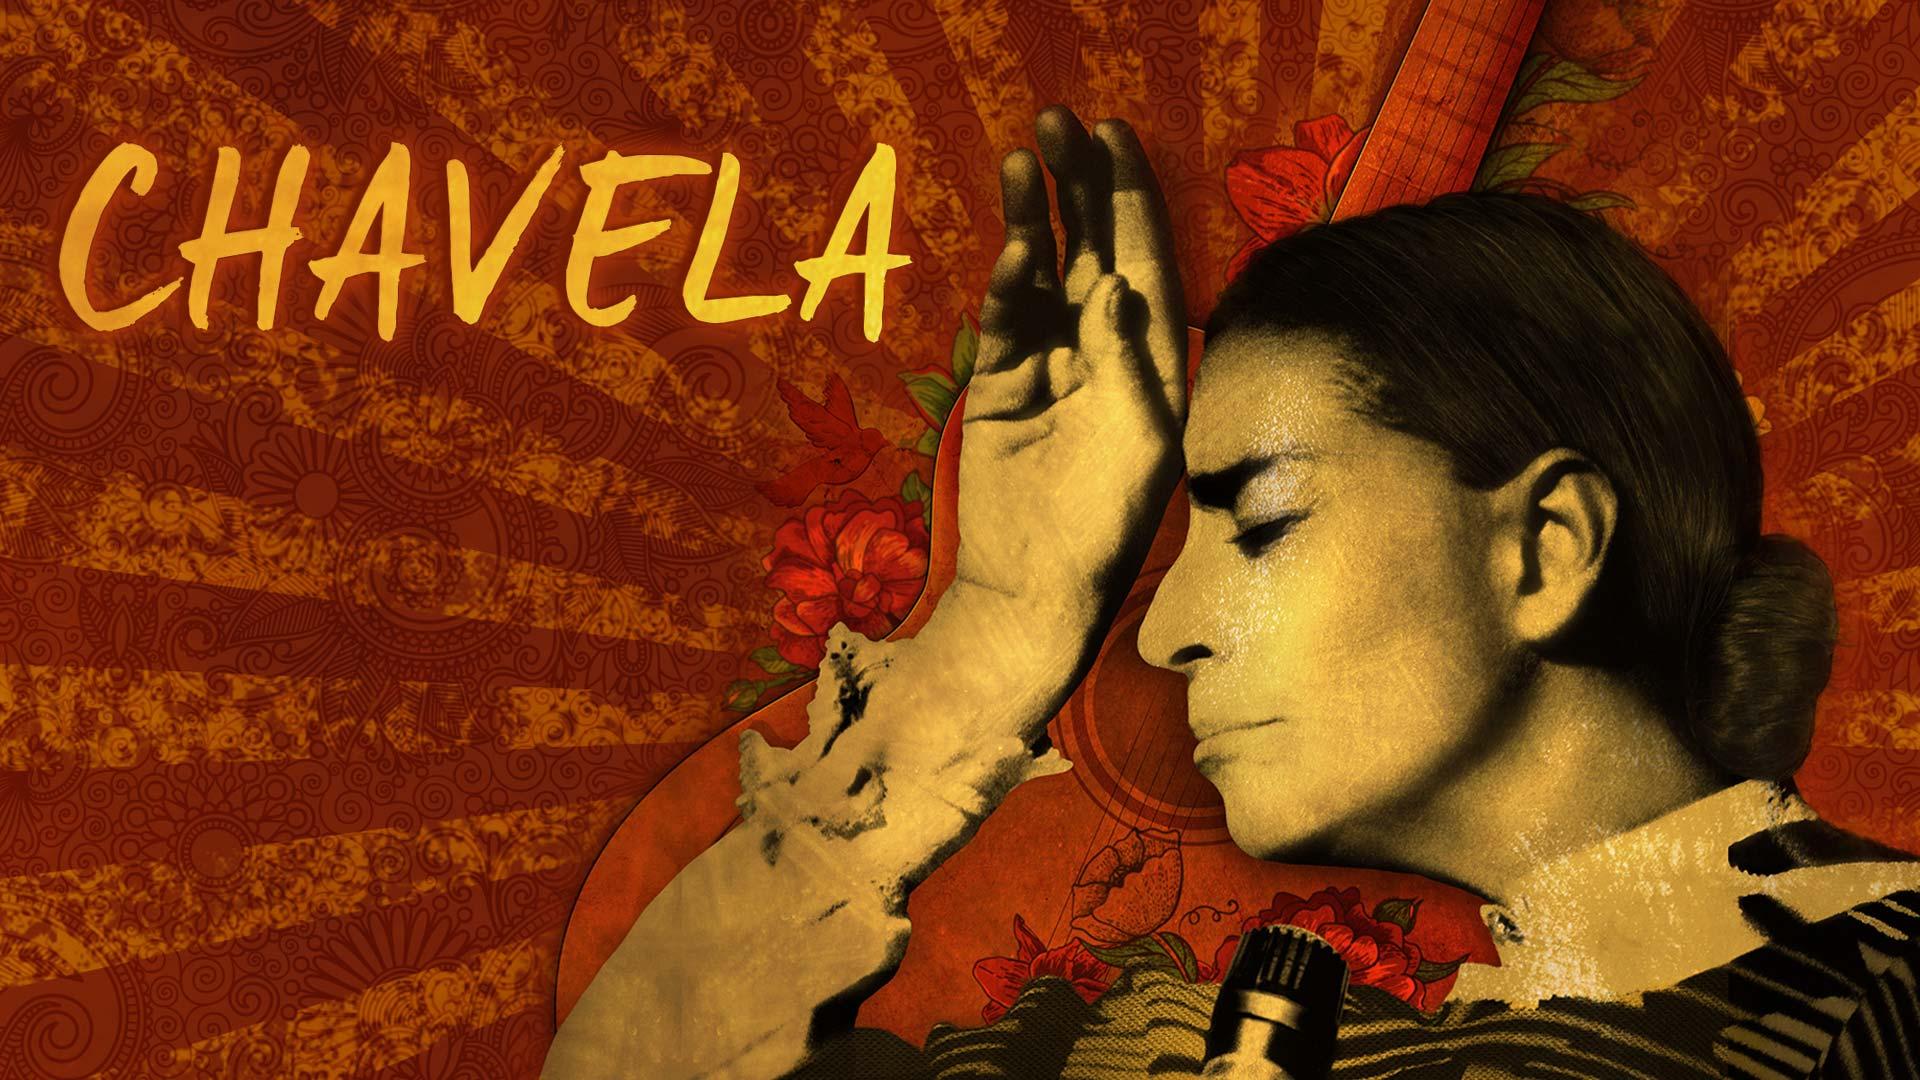 Chavela - image